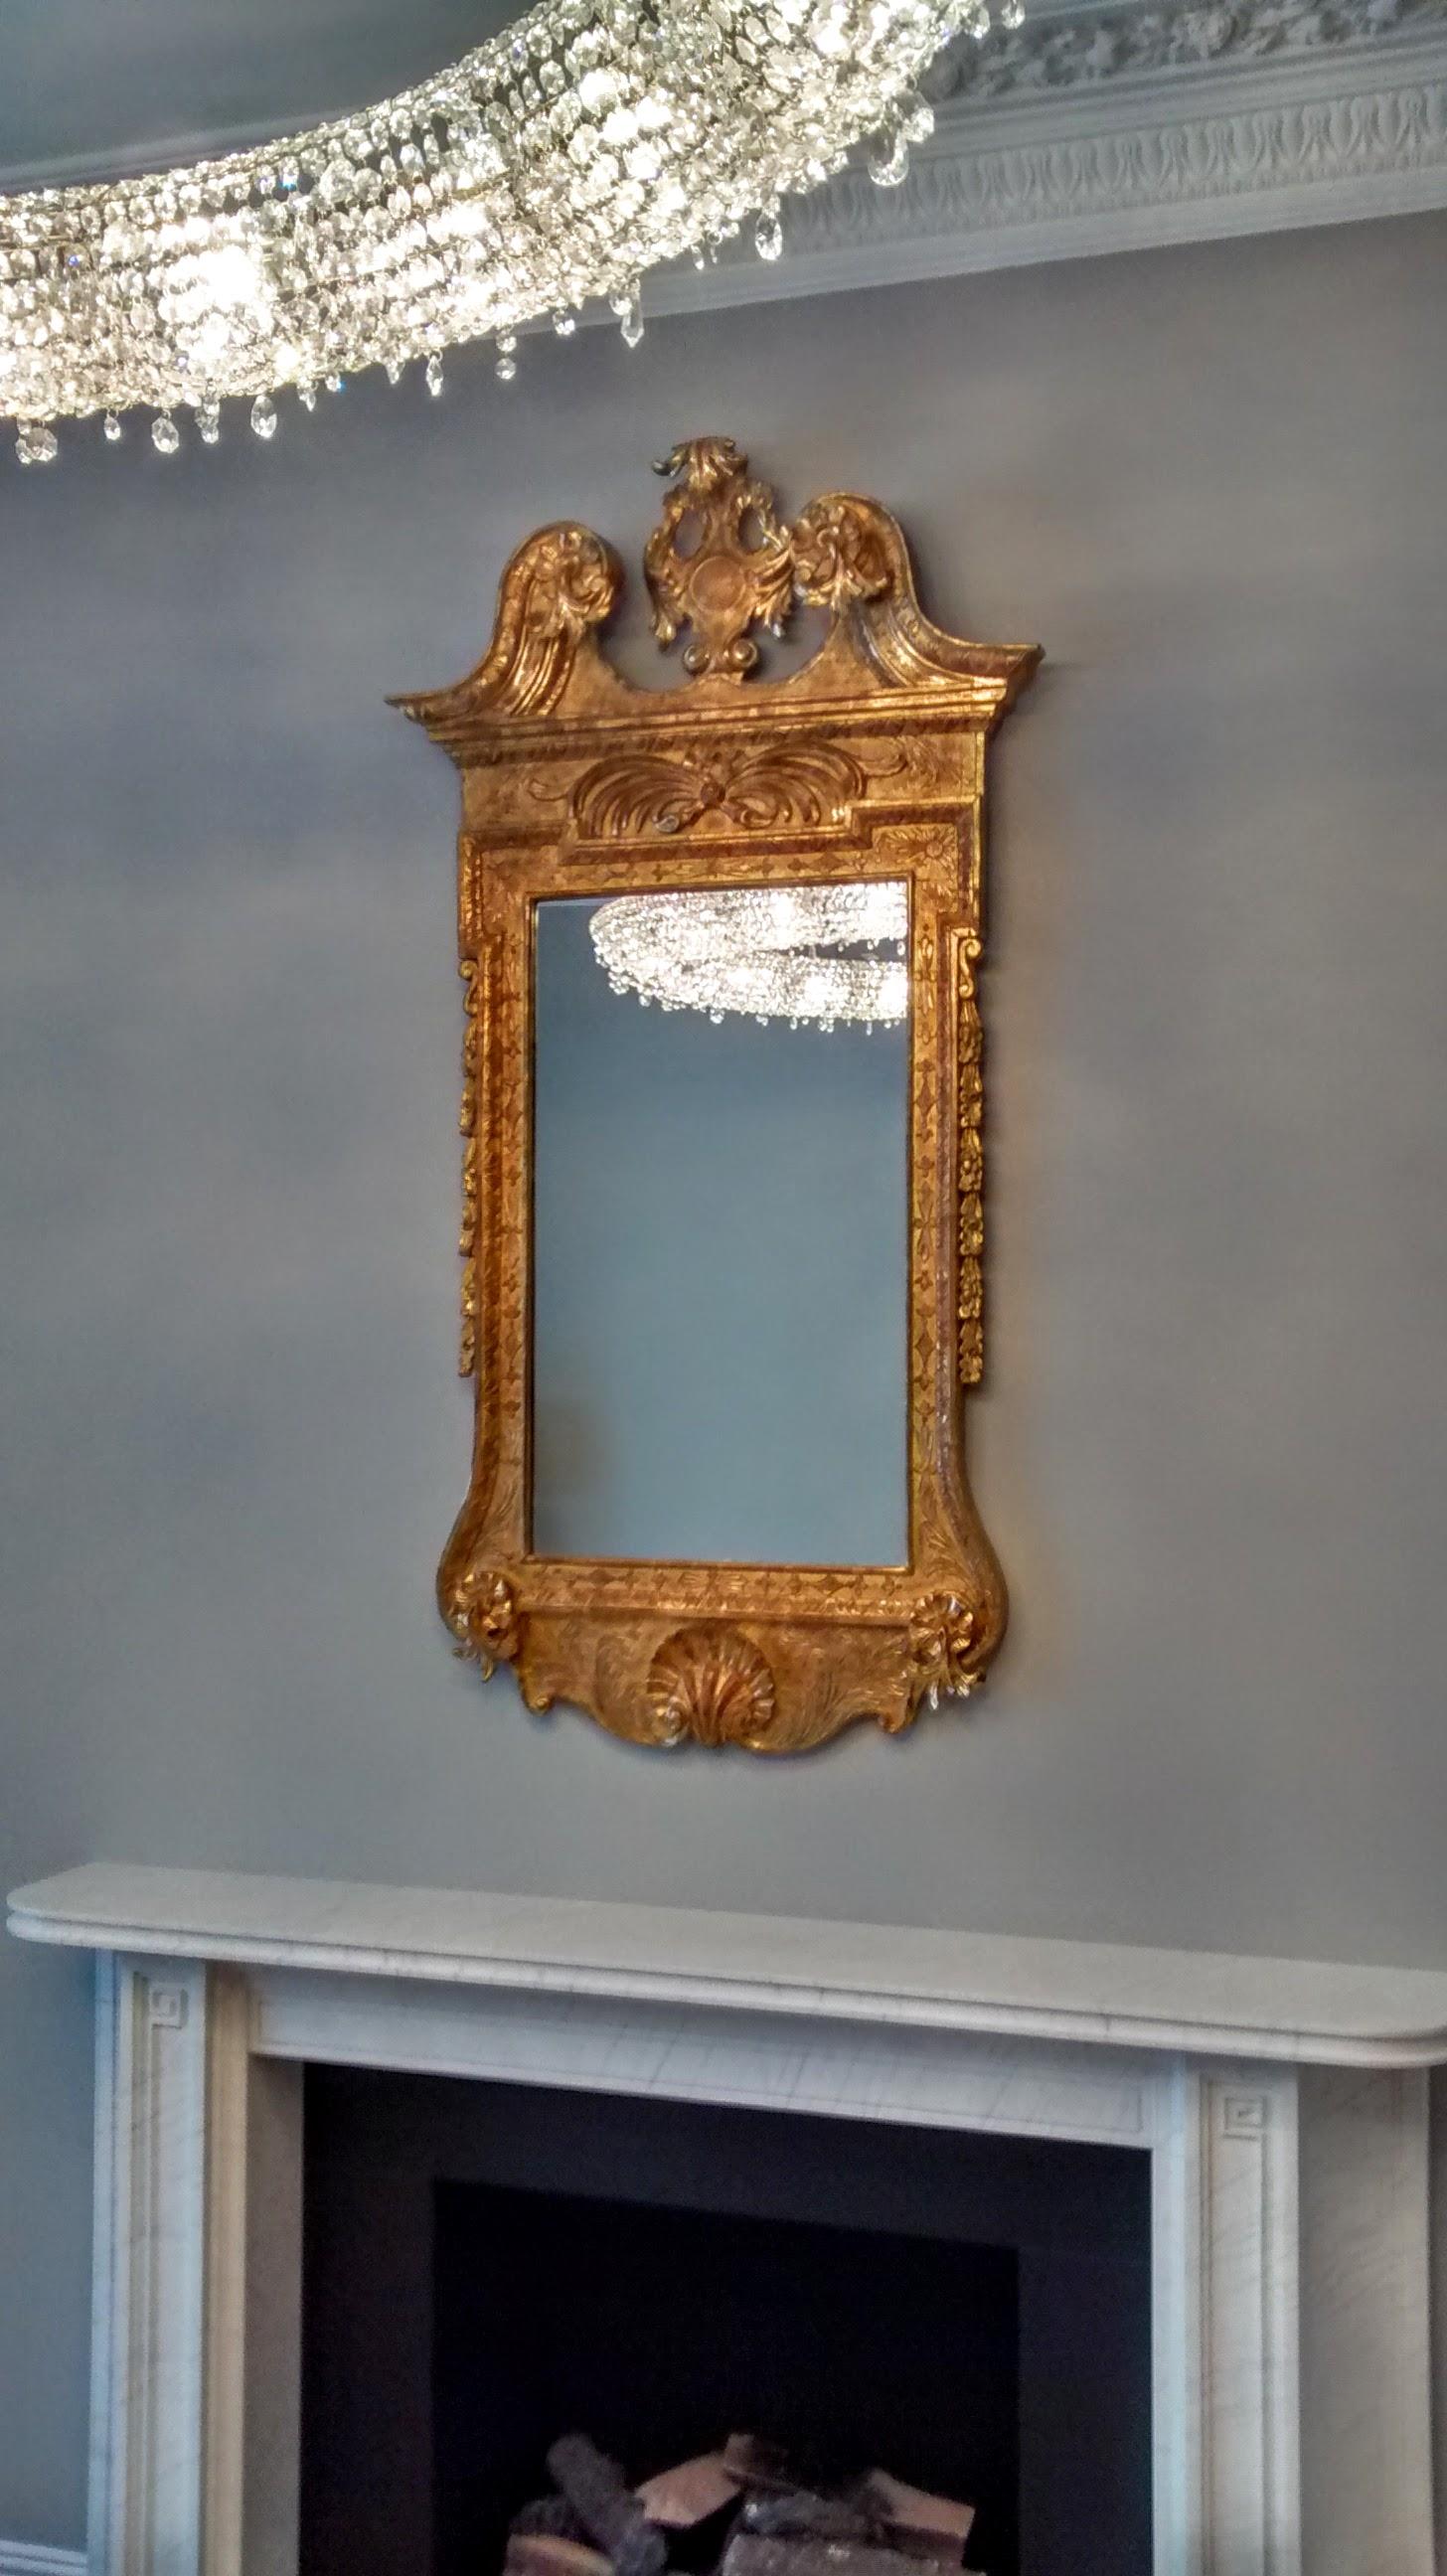 Ornate gilt framed antique mirror